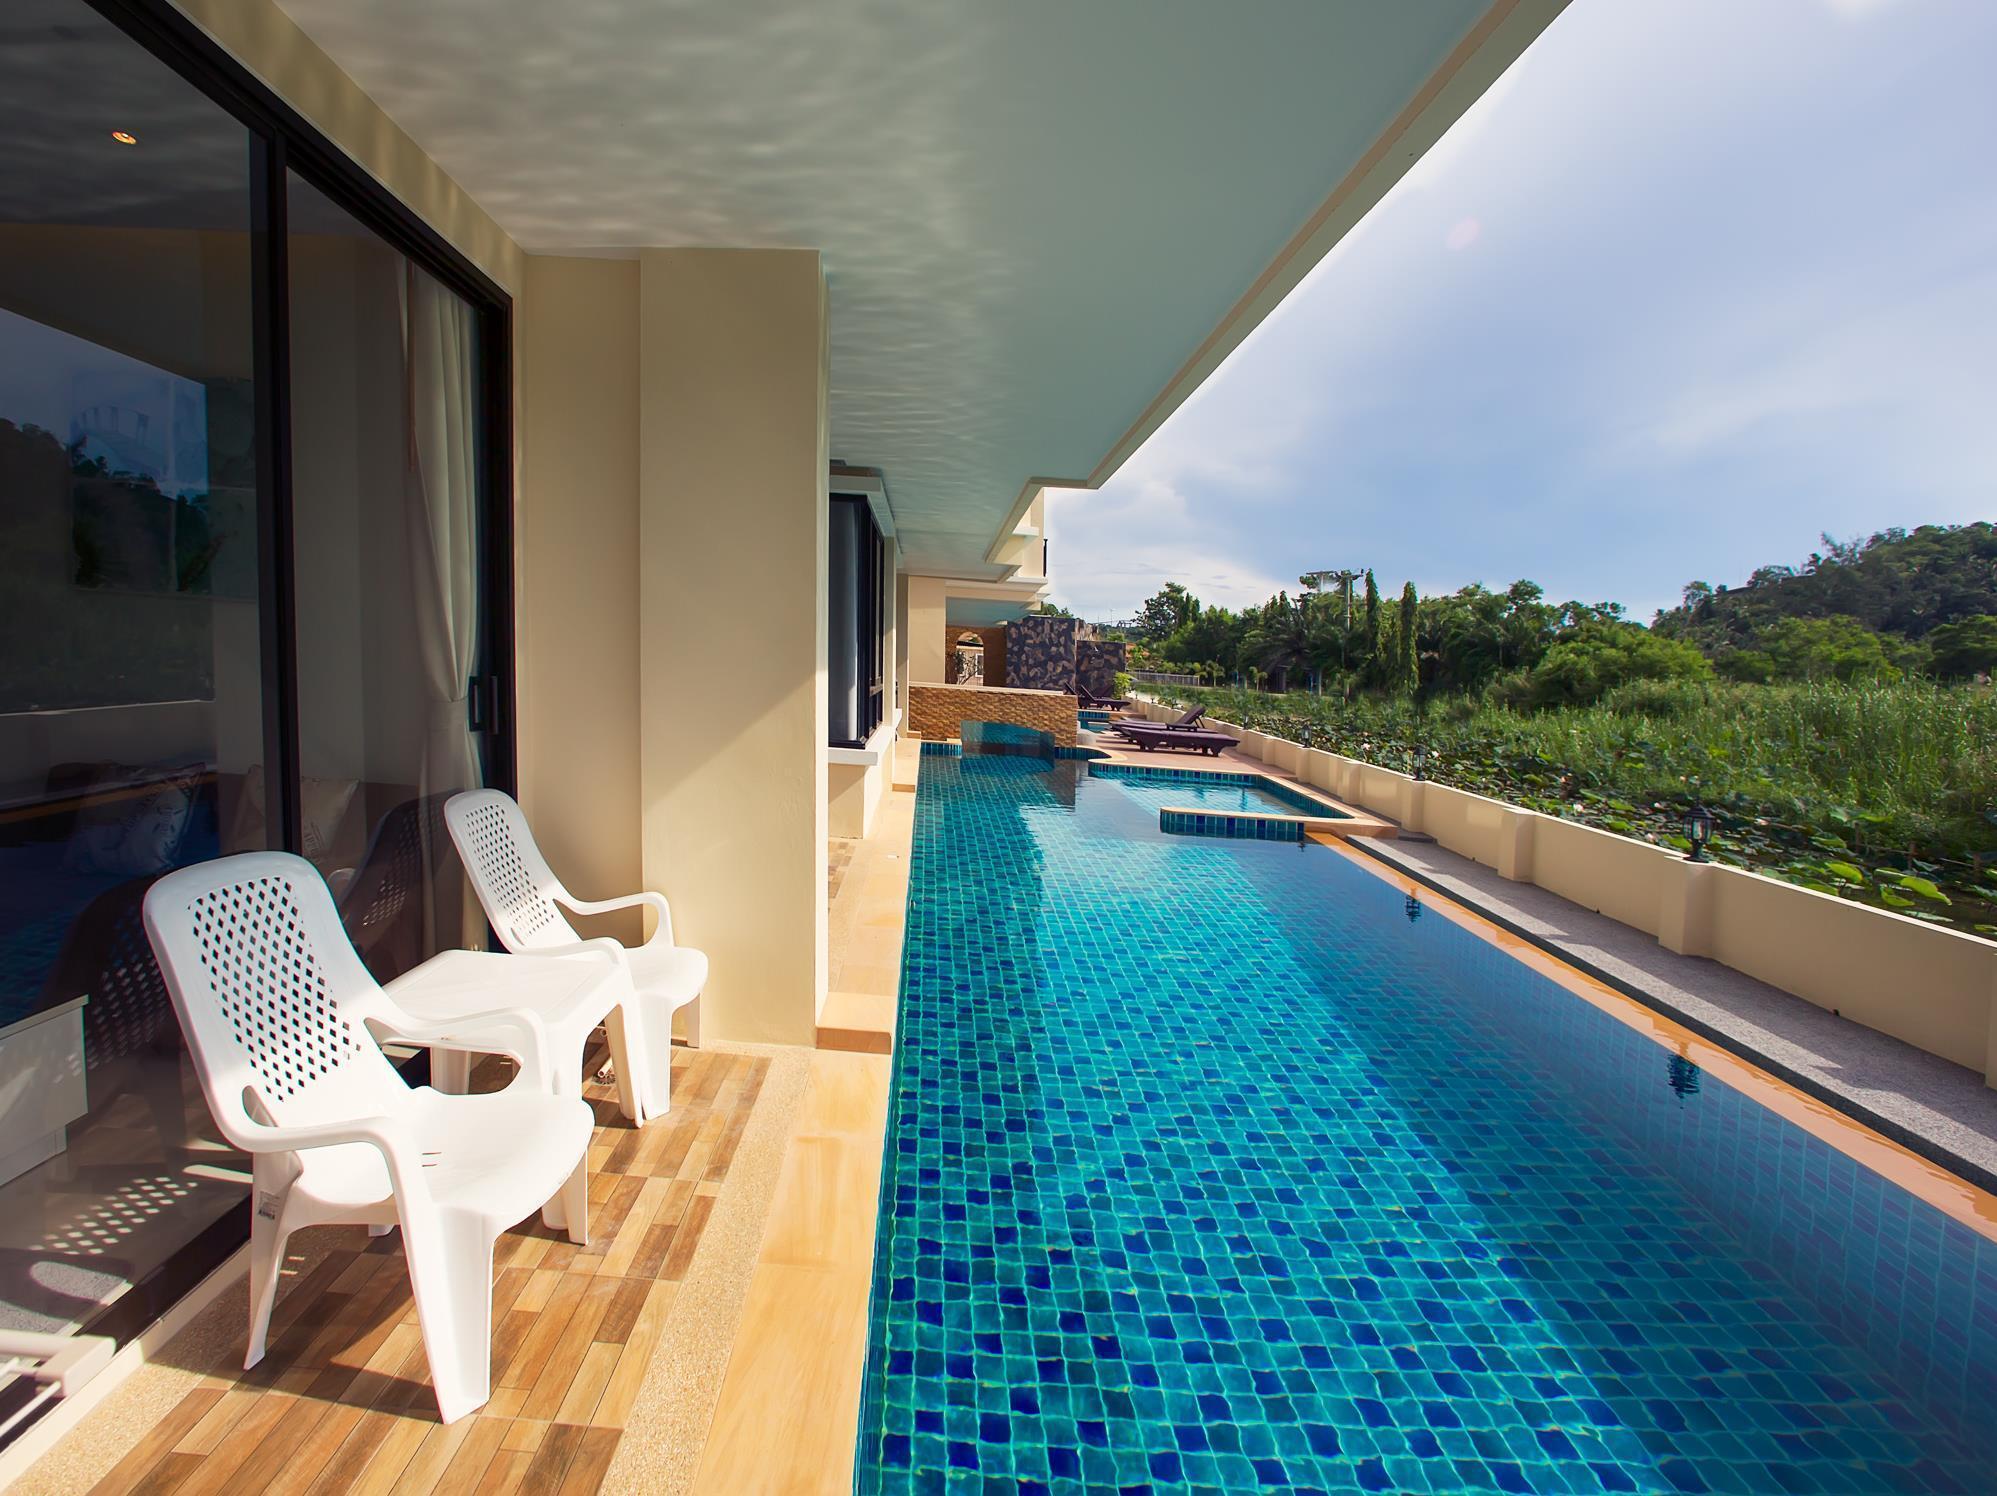 The Lago Apartments by Tropiclook เดอะ ลาโก อพาร์ตเมนต์ บาย ทรอปิคลุค